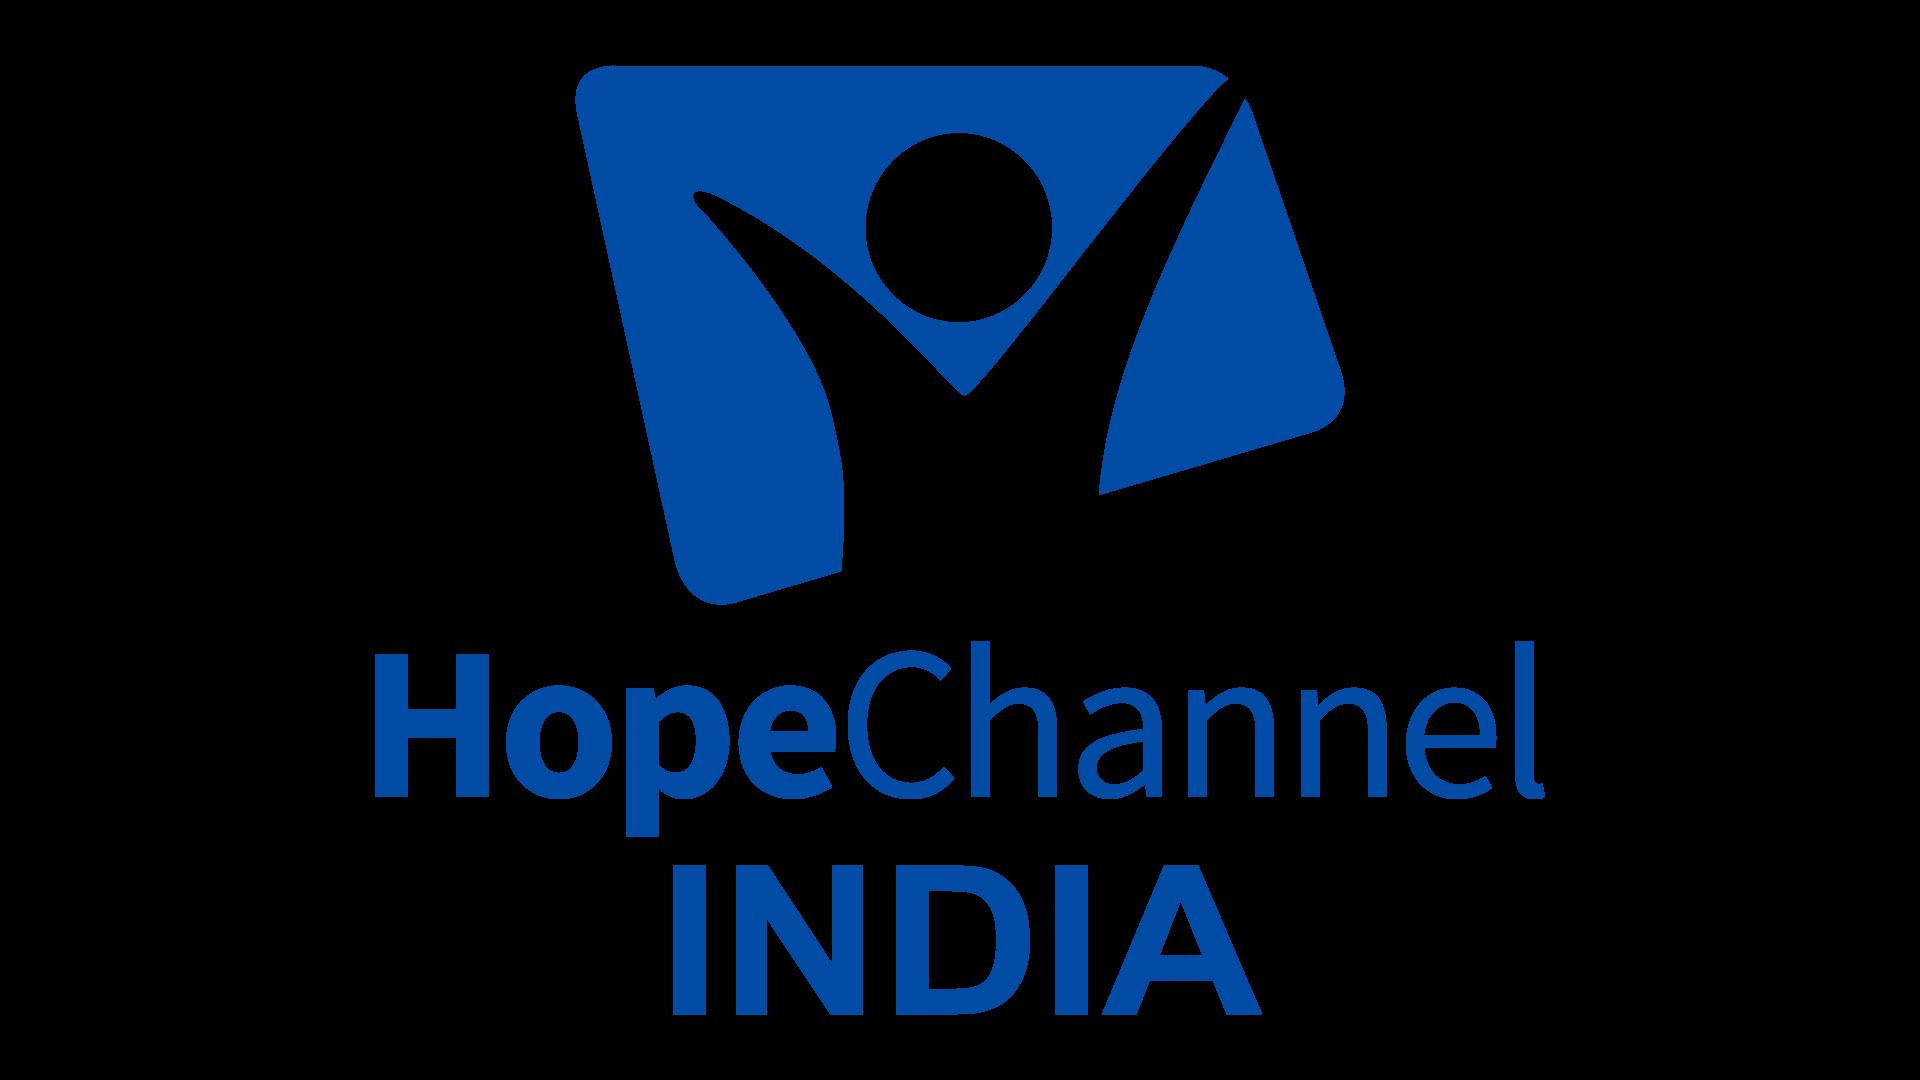 Hope Channel India en vivo, Online